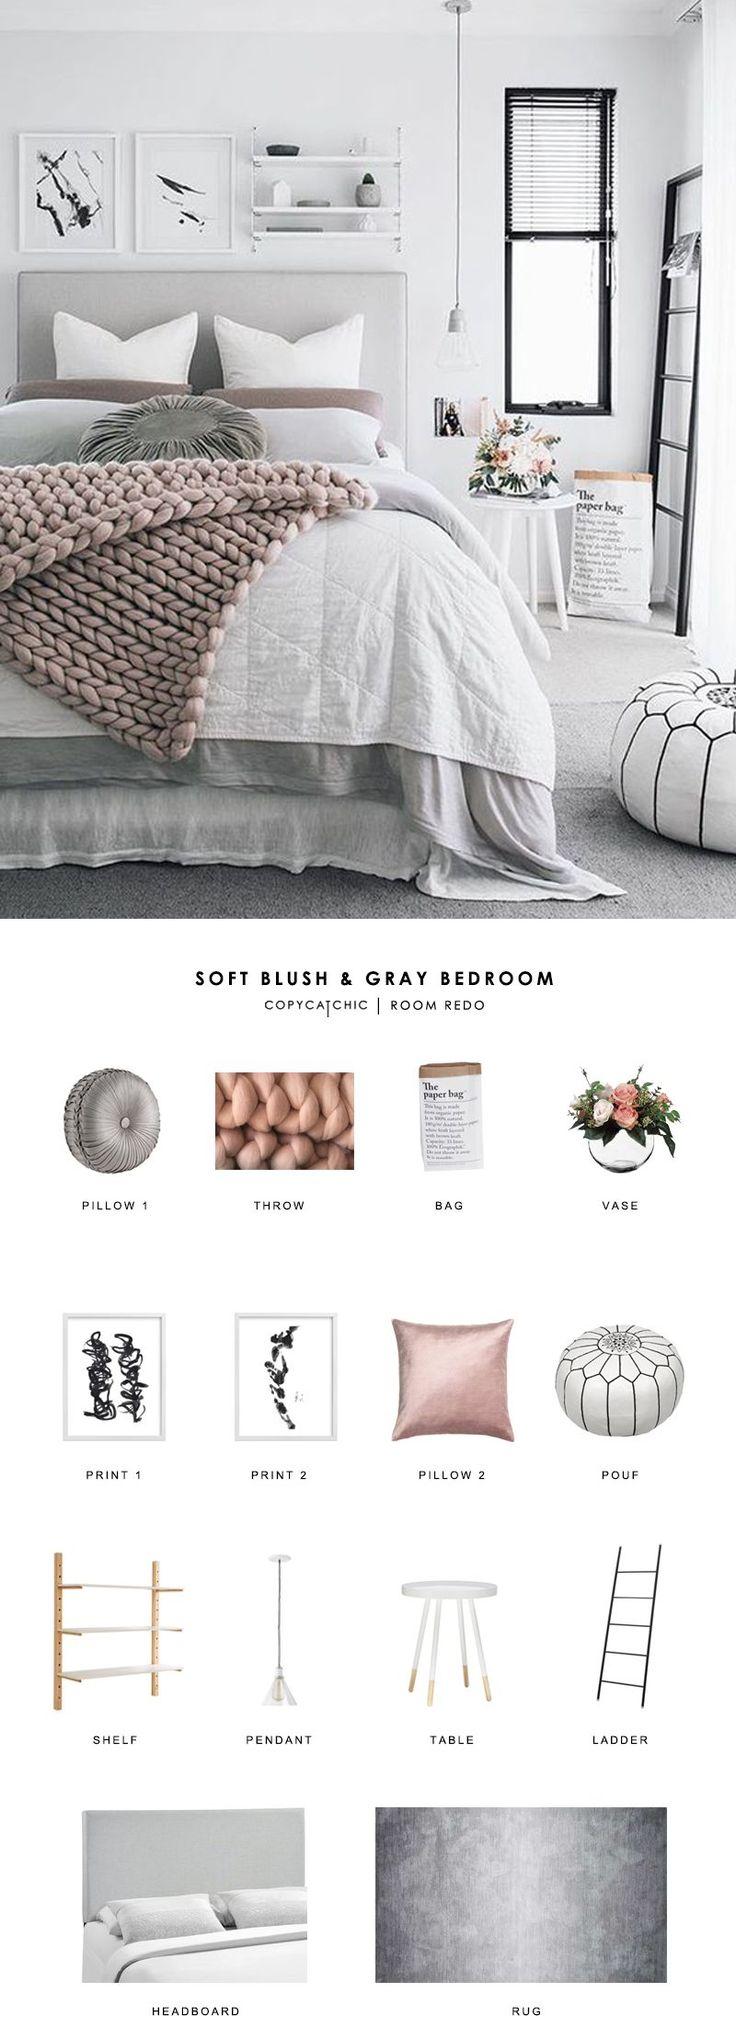 Bedroom Decoration – Mistletoe Decor – #Free #Design Ideas Gallery